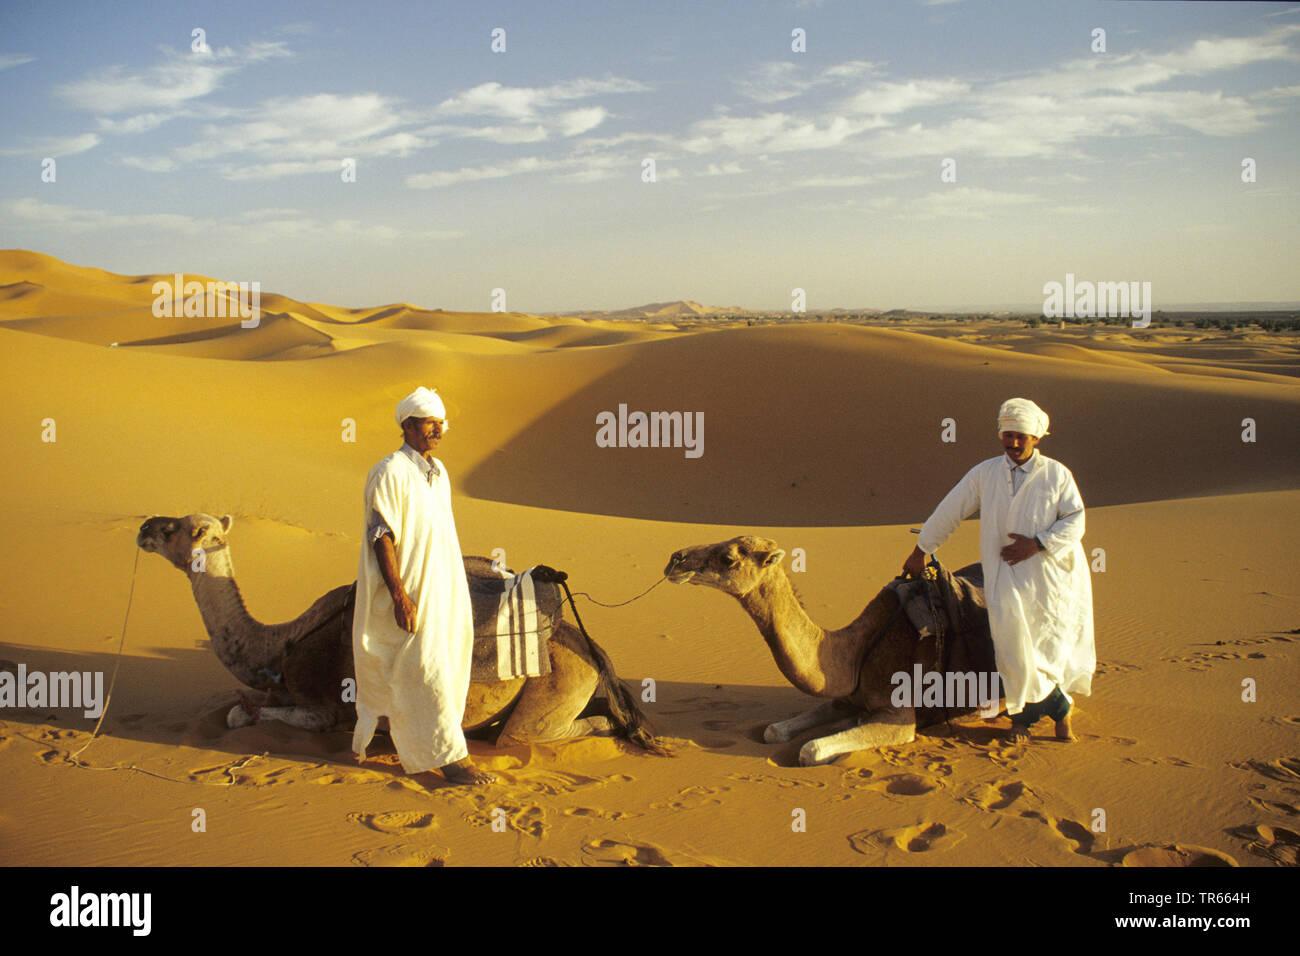 Dromedar, Einhoeckriges Kamel (Camelus dromedarius), Kameltreiber auf Sandduenen im Ziz-Tal, Marokko, Marokko, Erg Chebbi, Ziz-Tal | dromedary, one-hu - Stock Image